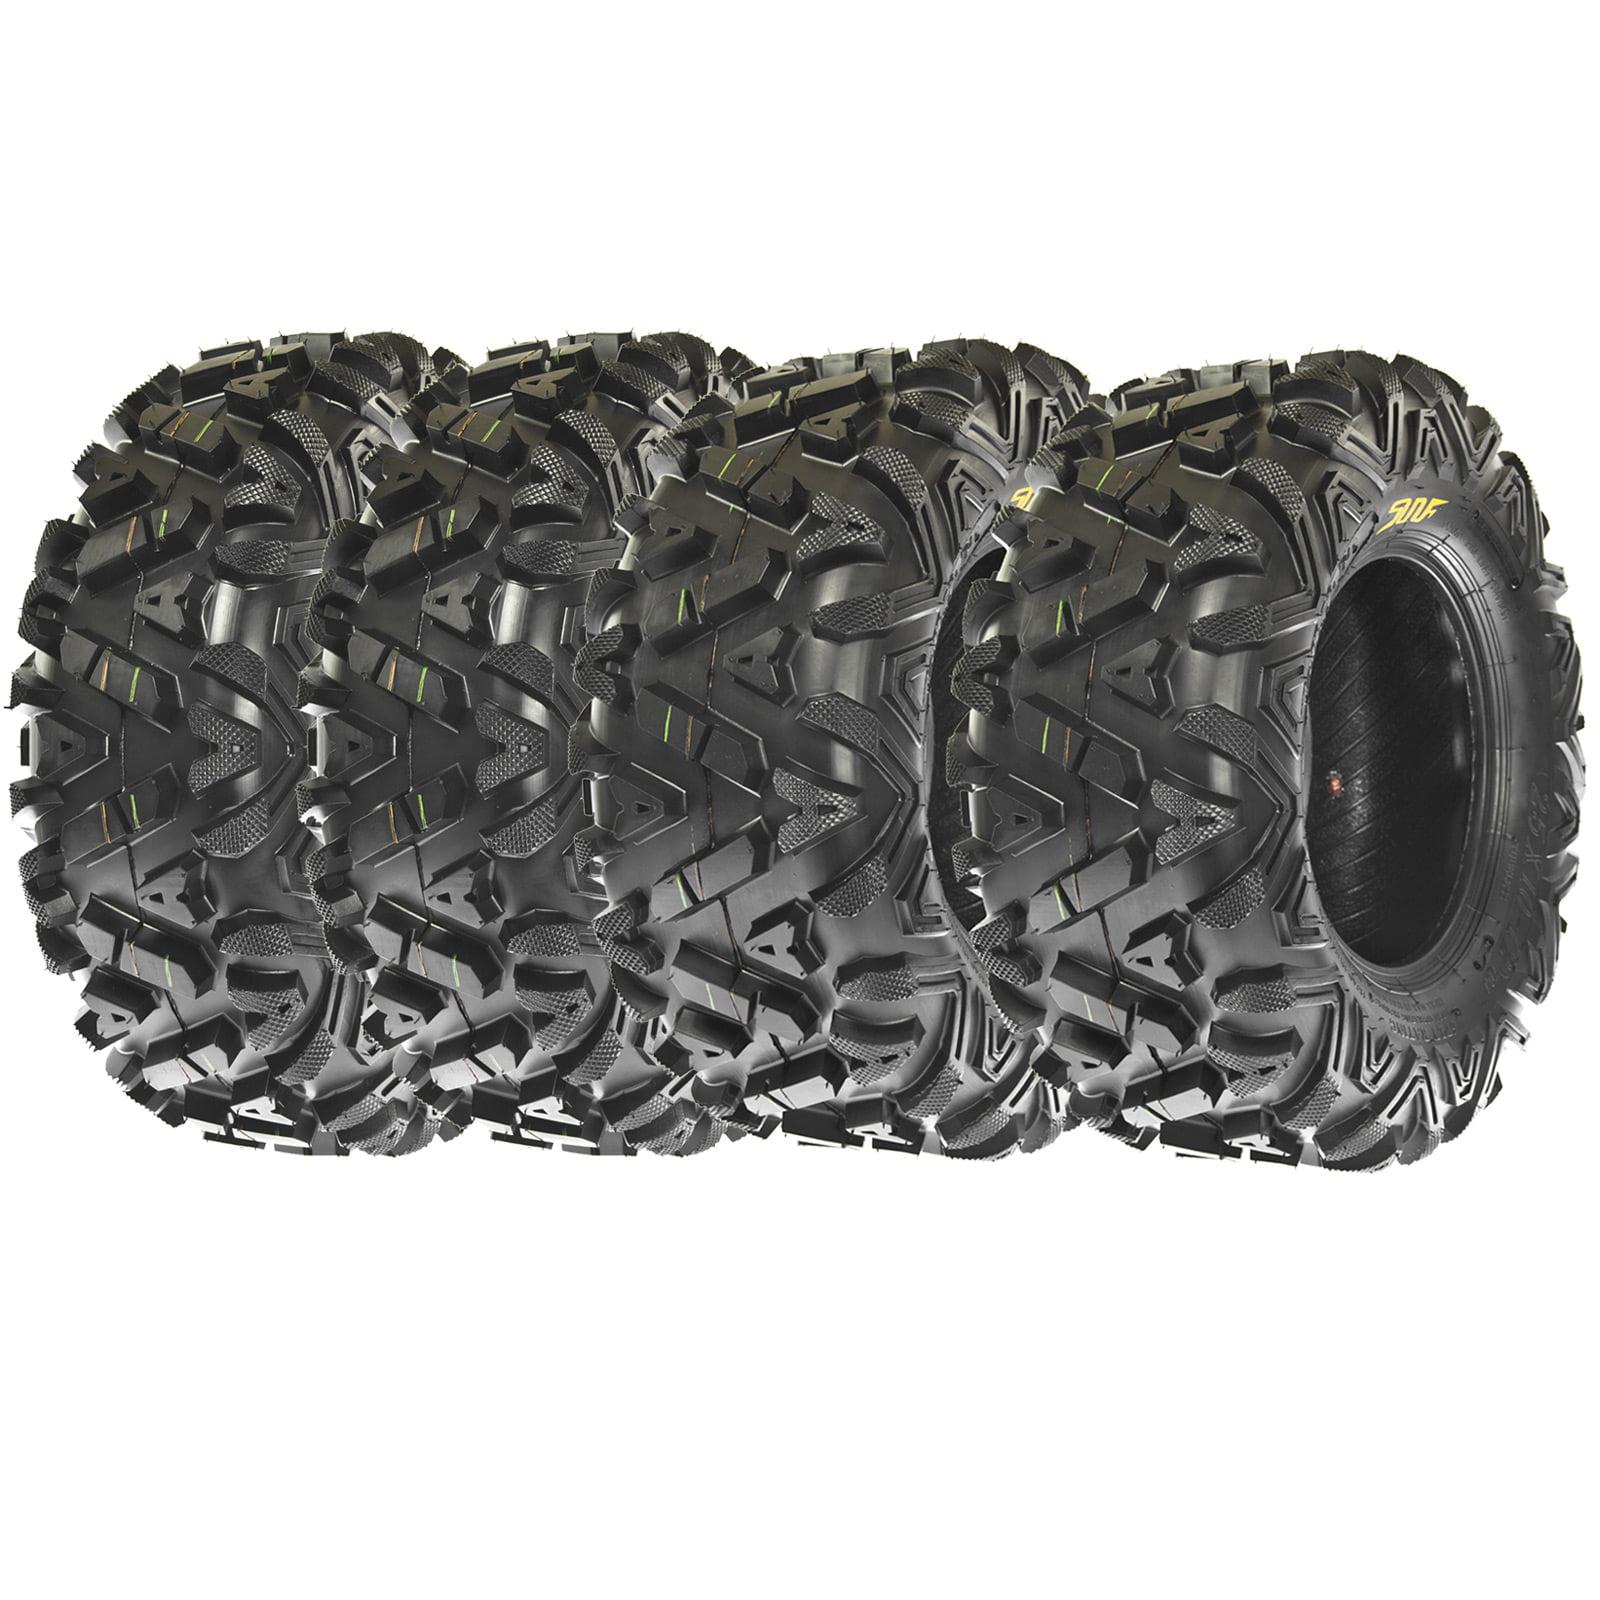 SunF All Terrain ATV UTV Tires 24x8-12 & 24x10-11 6 PR A0...